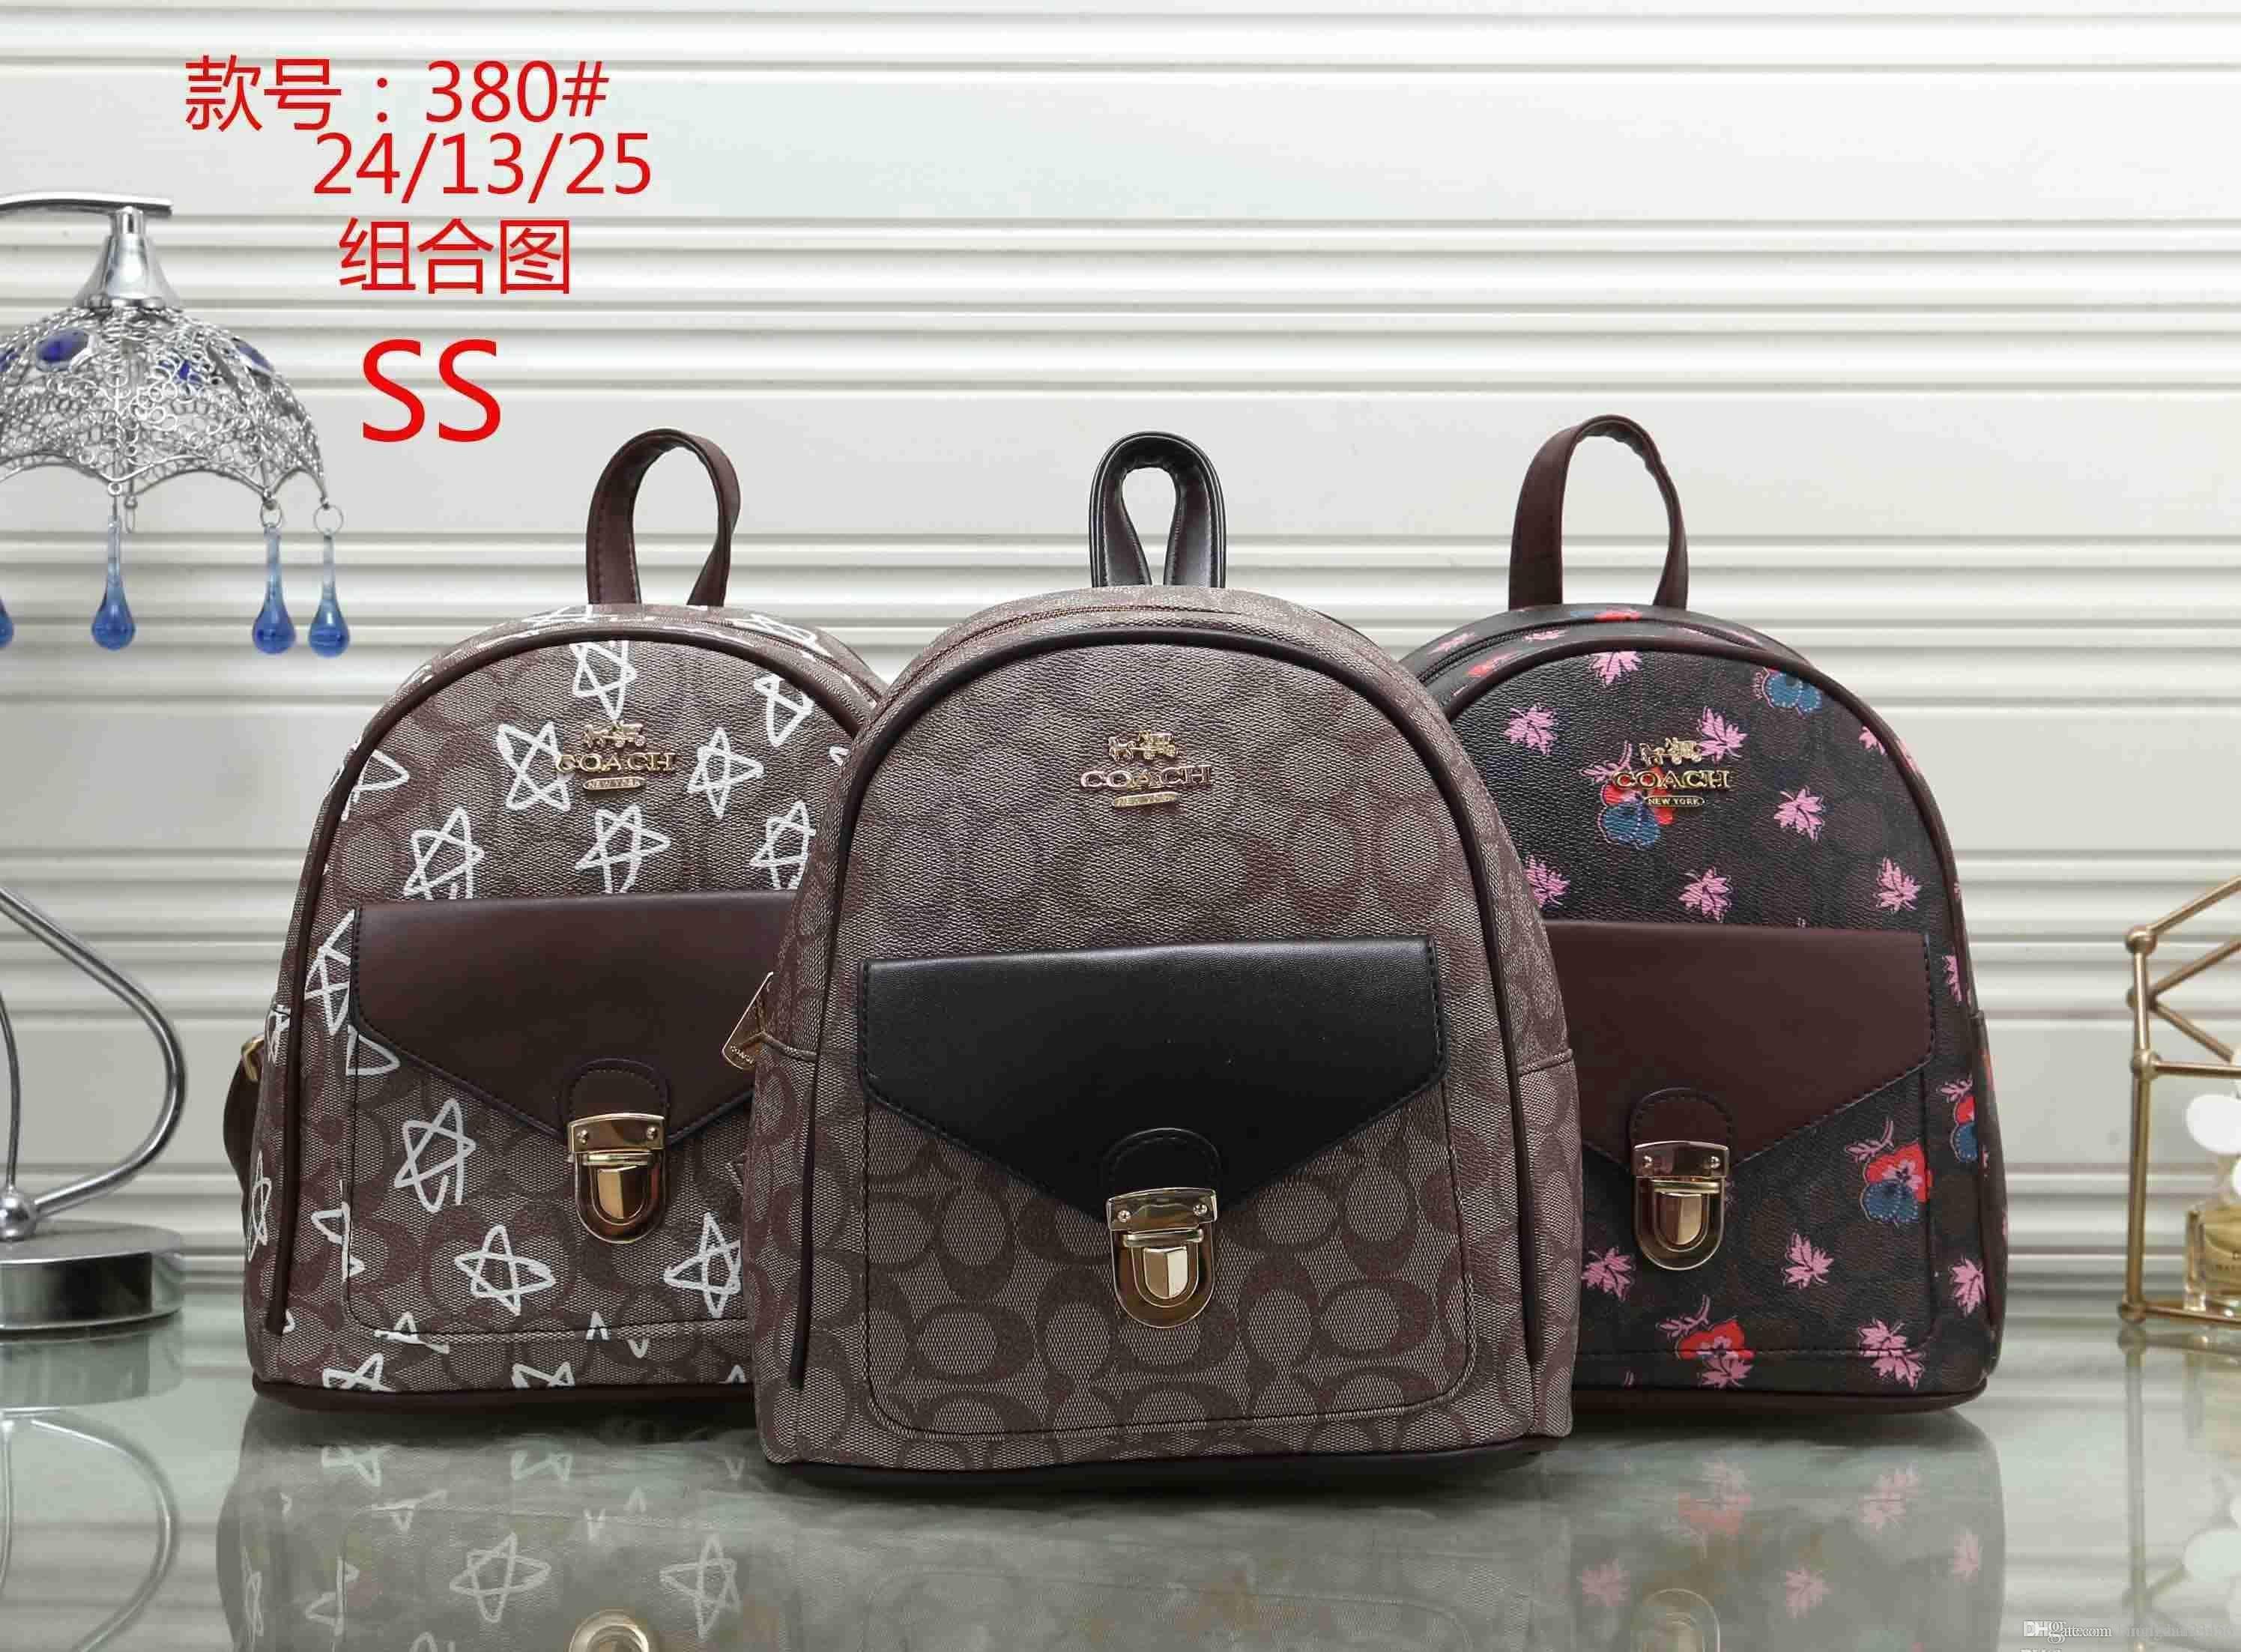 dbd0a6092d 2019 MK 380 SS NEW Styles Fashion Bags Ladies Handbags Designer Bags Women  Tote Bag Luxury Brands Bags Single Shoulder Bag From Handbag215